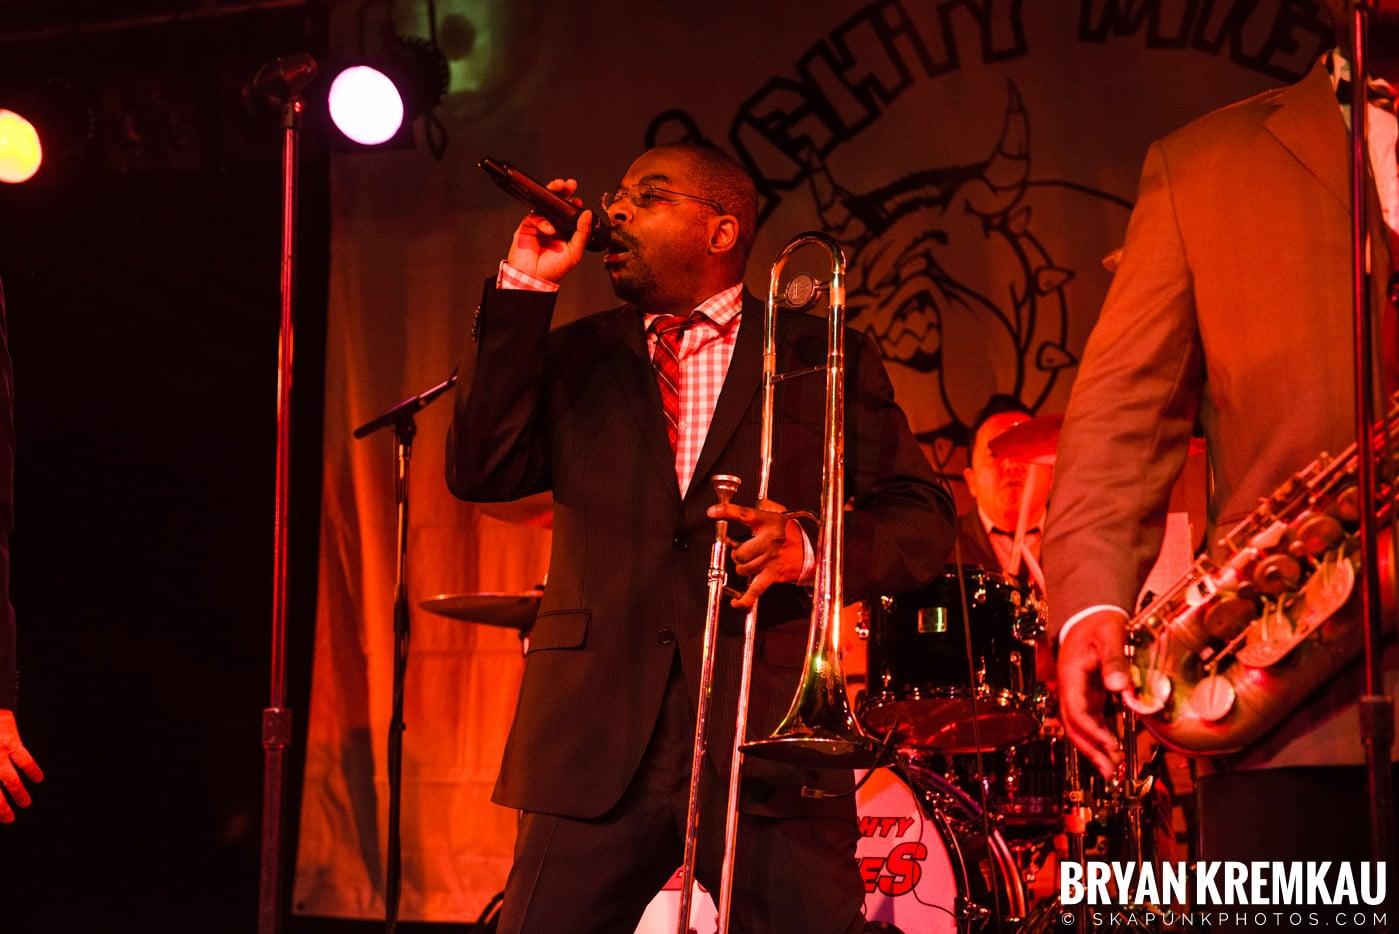 Mighty Mighty Bosstones @ Starland Ballroom, Sayreville, NJ - 7.29.17 (37)